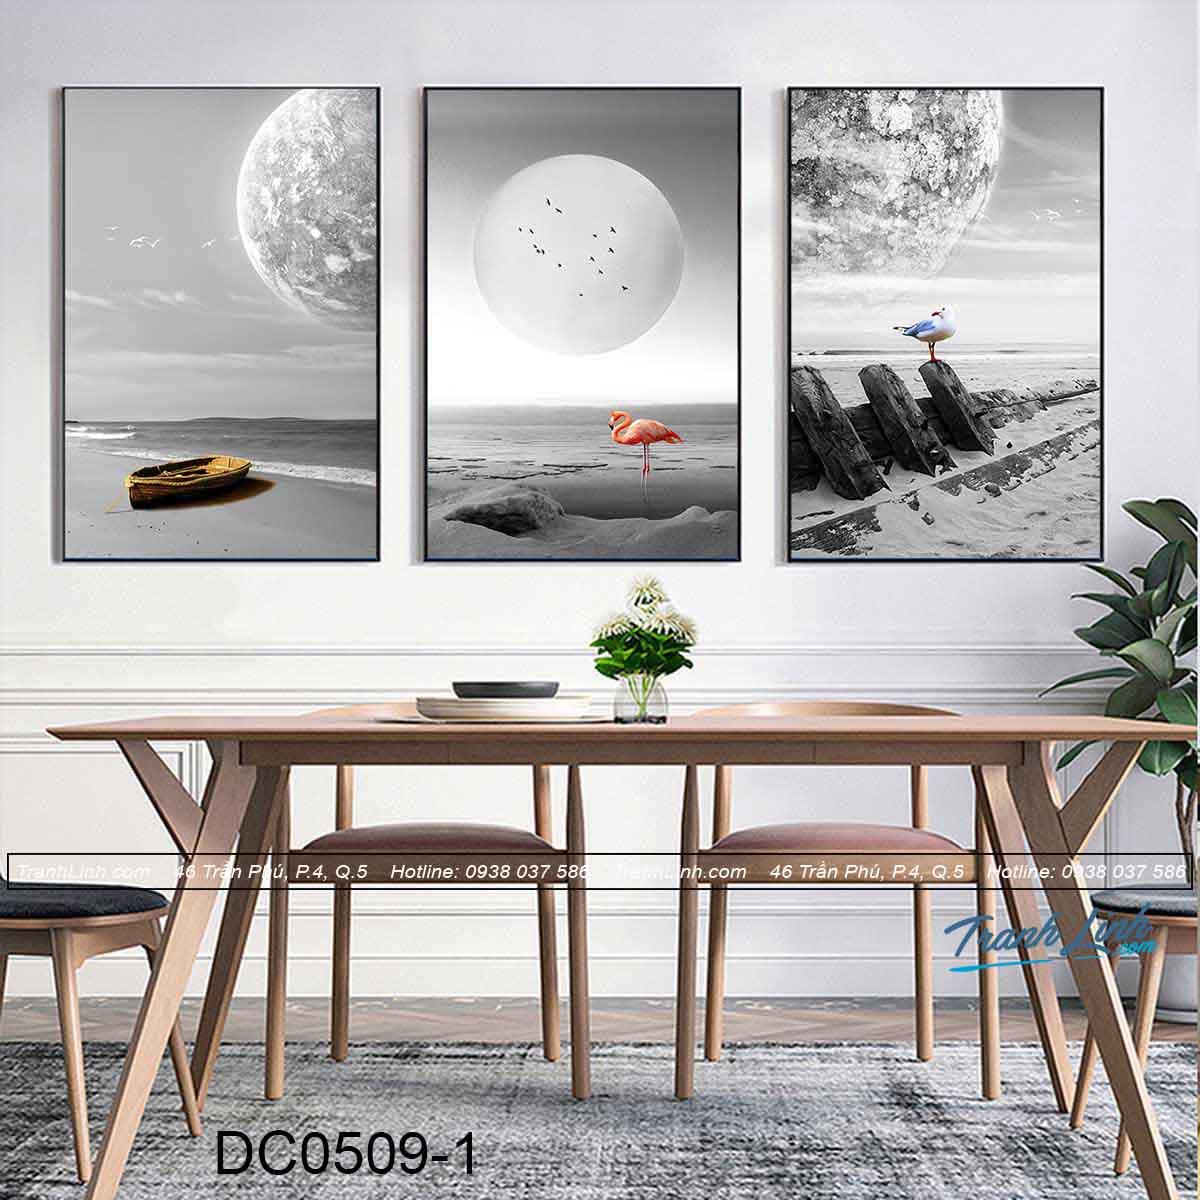 bo-tranh-canvas-trang-tri-decor-dc0509-1.jpg